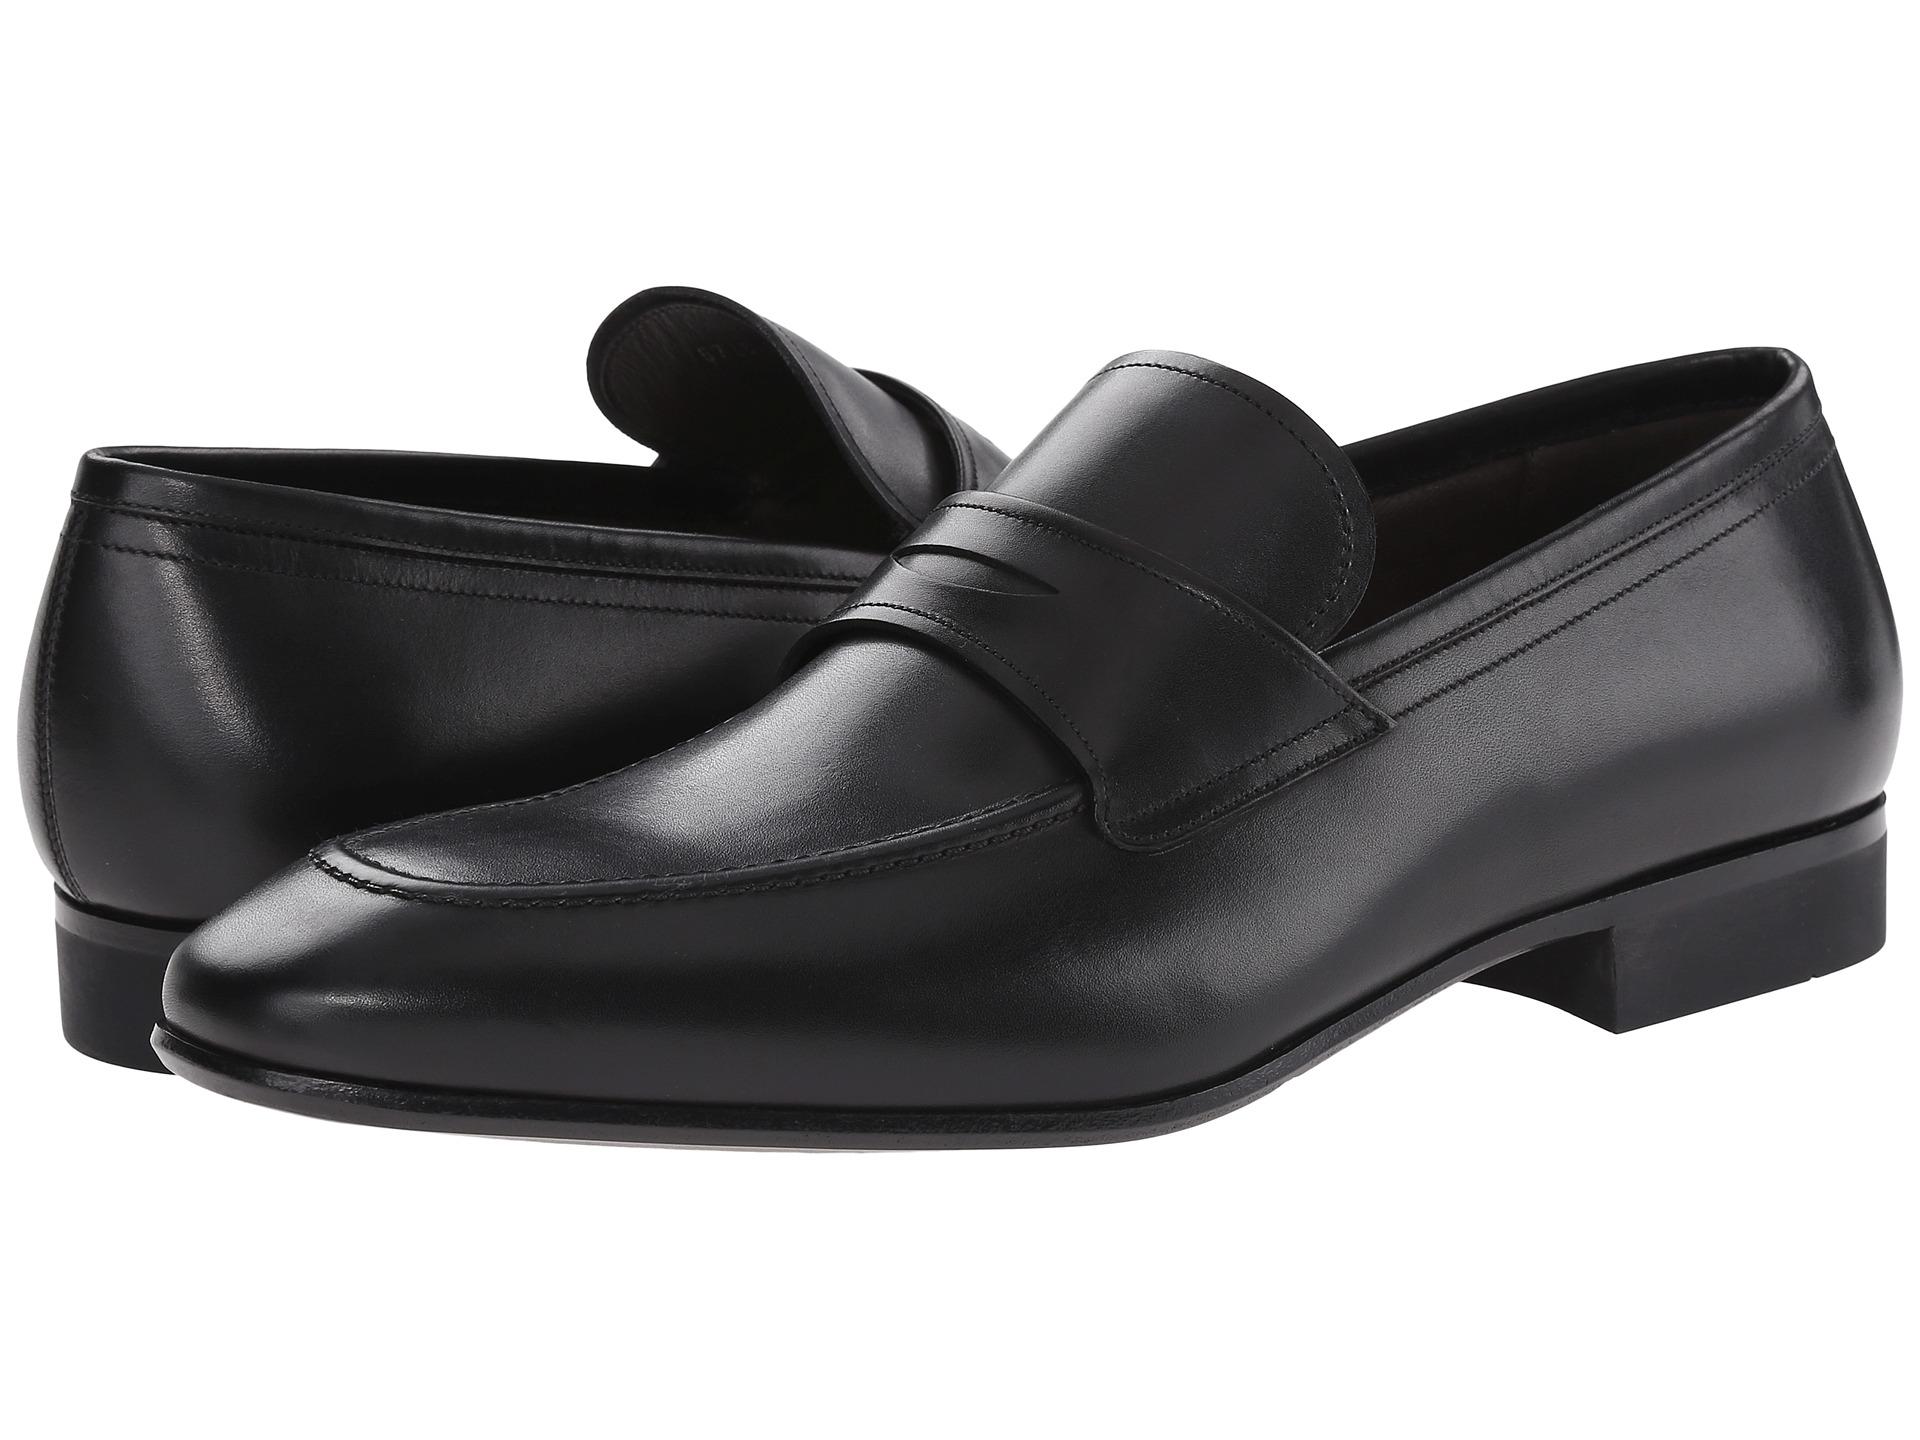 Ferragamo Metro Loafer In Black For Men | Lyst